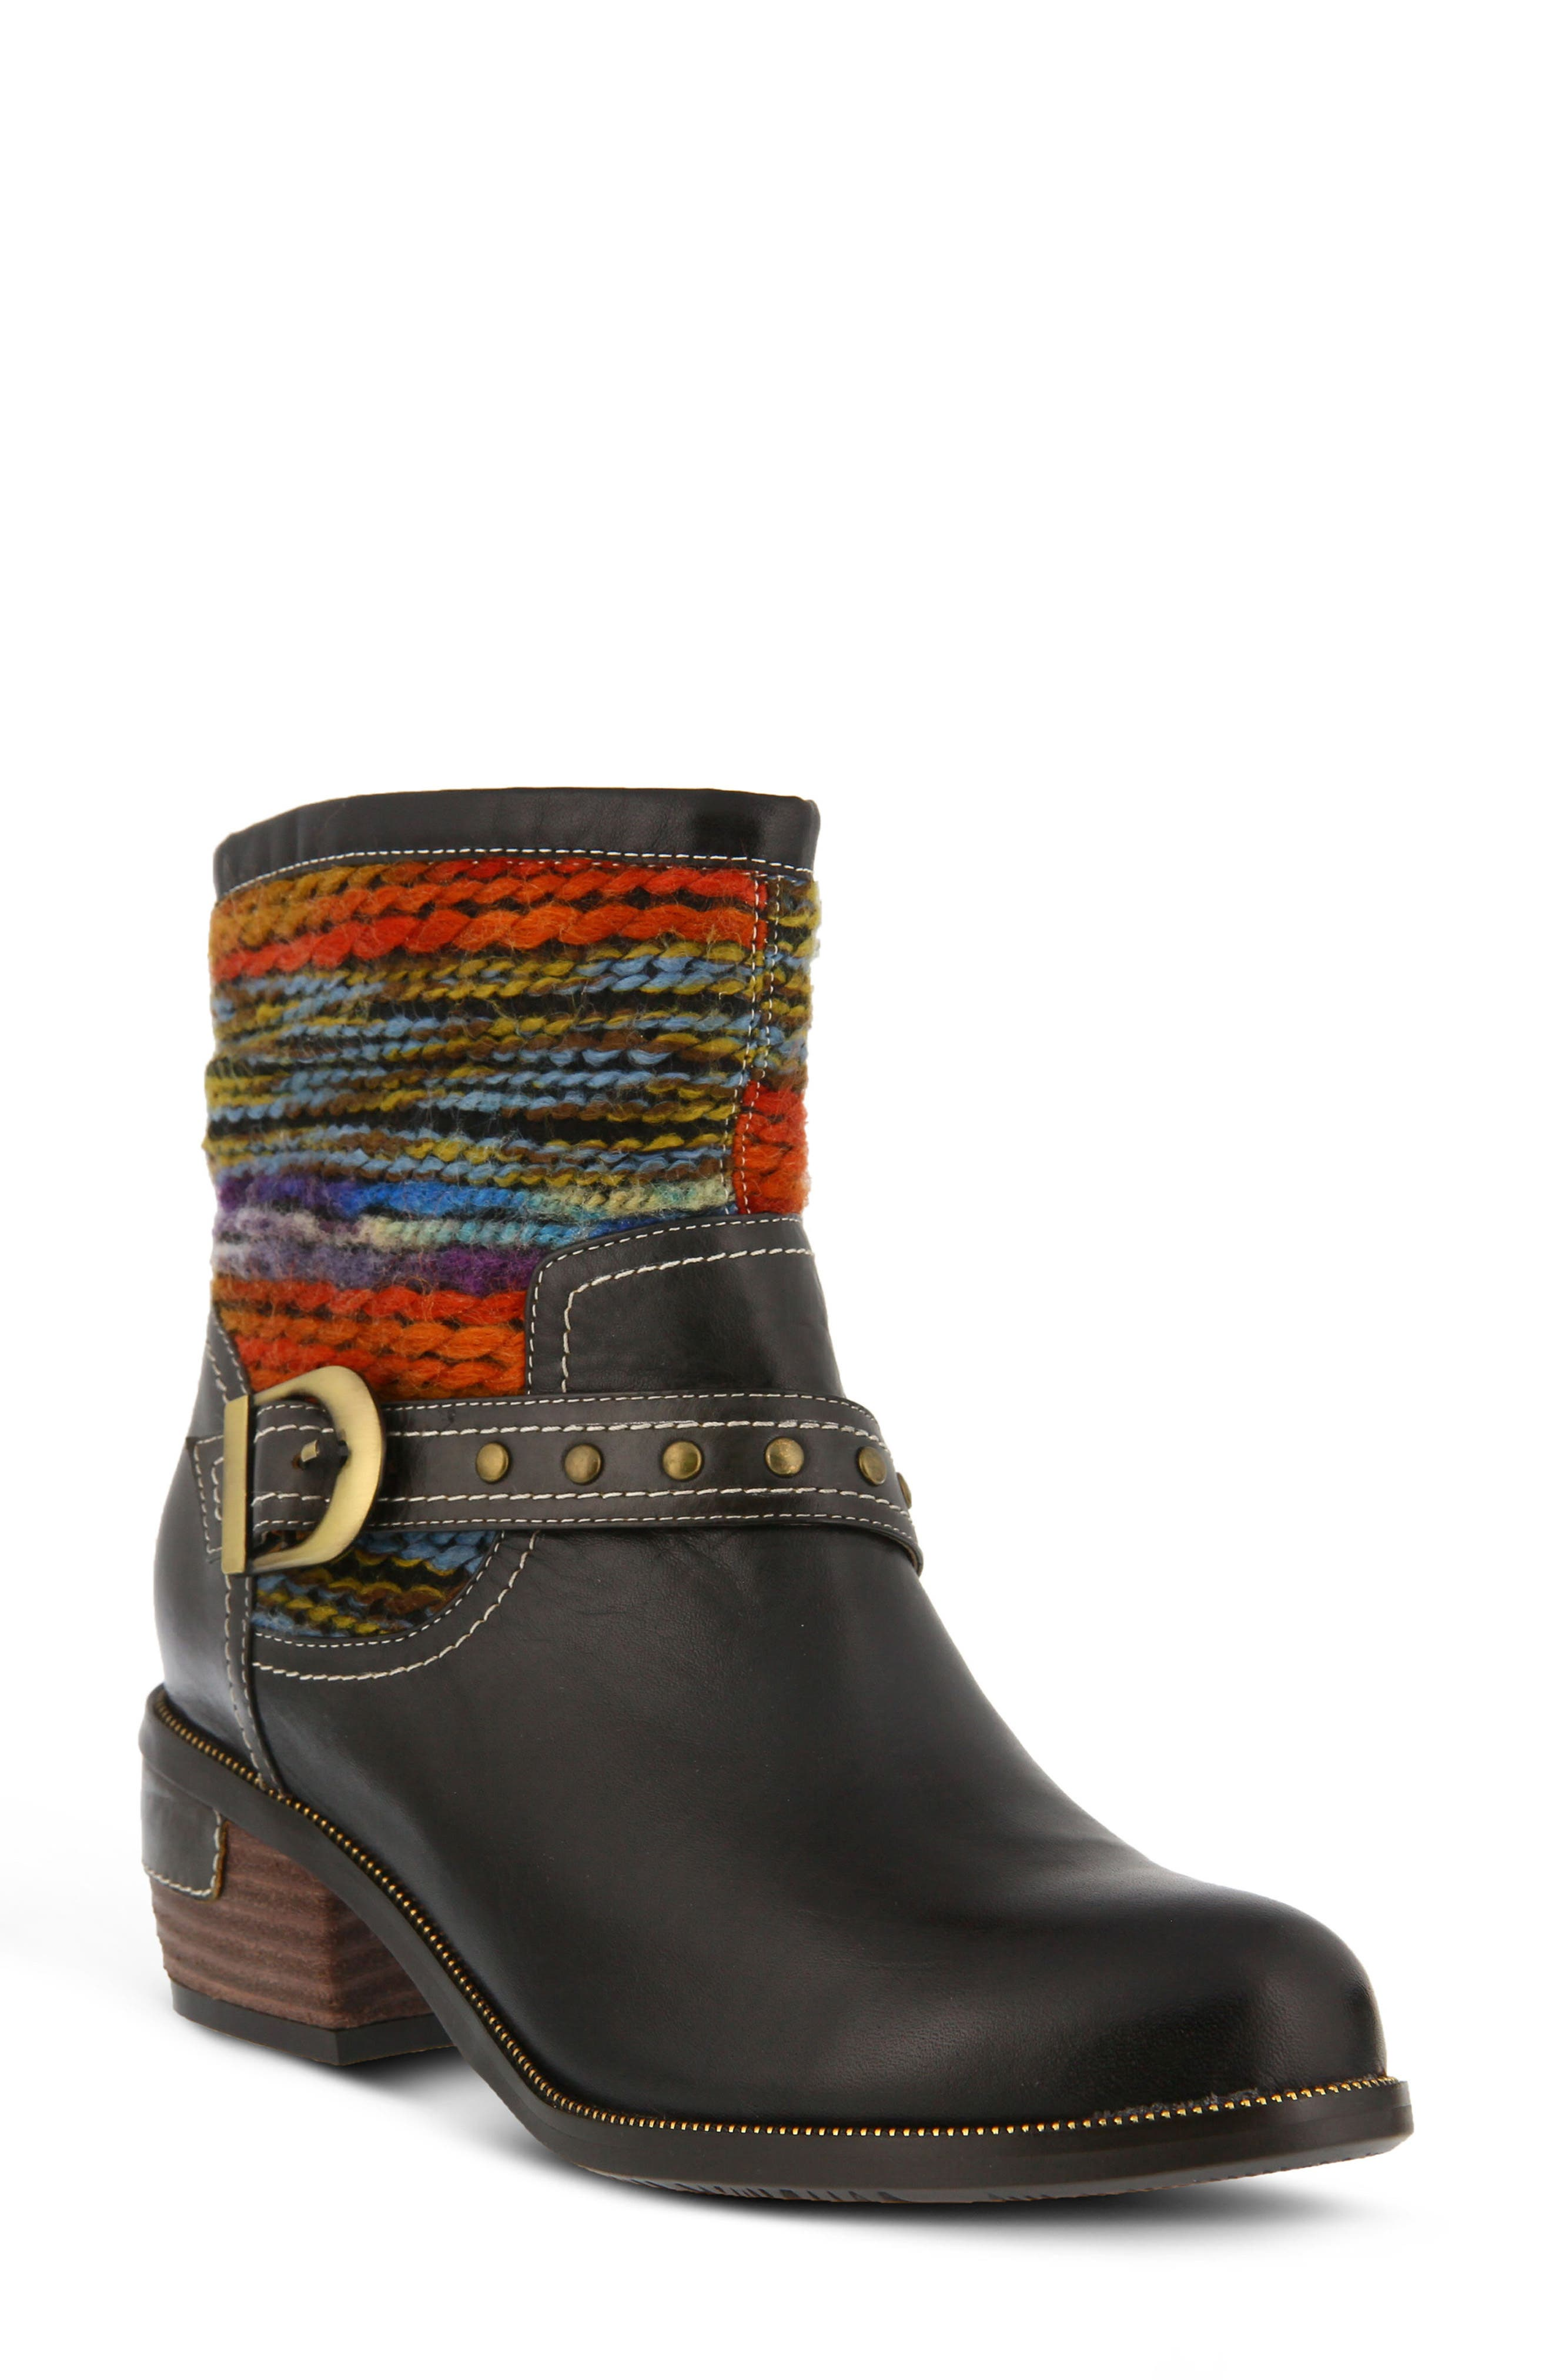 L'Artiste Gaetana Boot,                         Main,                         color, BLACK LEATHER